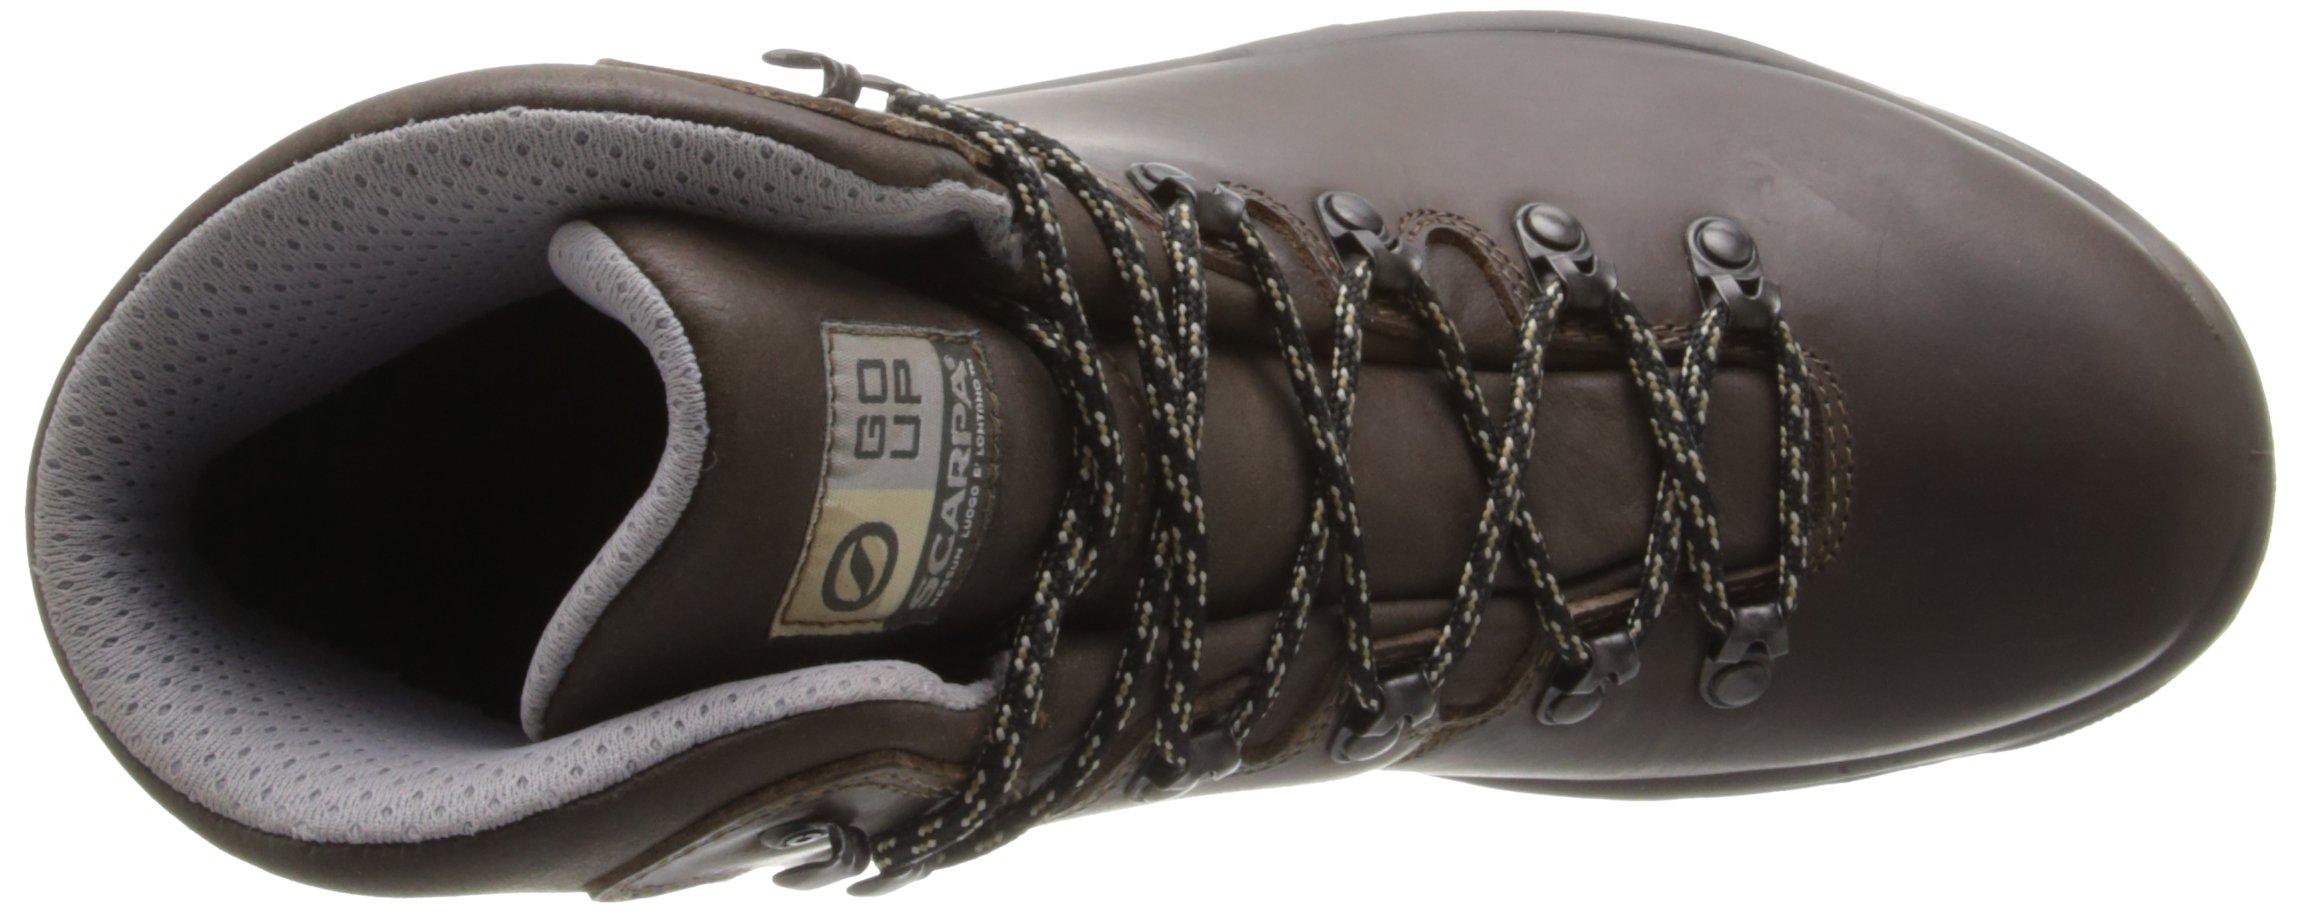 Scarpa Womens Women's Terra GTX Hiking Boot,Brown,42 EU/10 M US by SCARPA (Image #7)